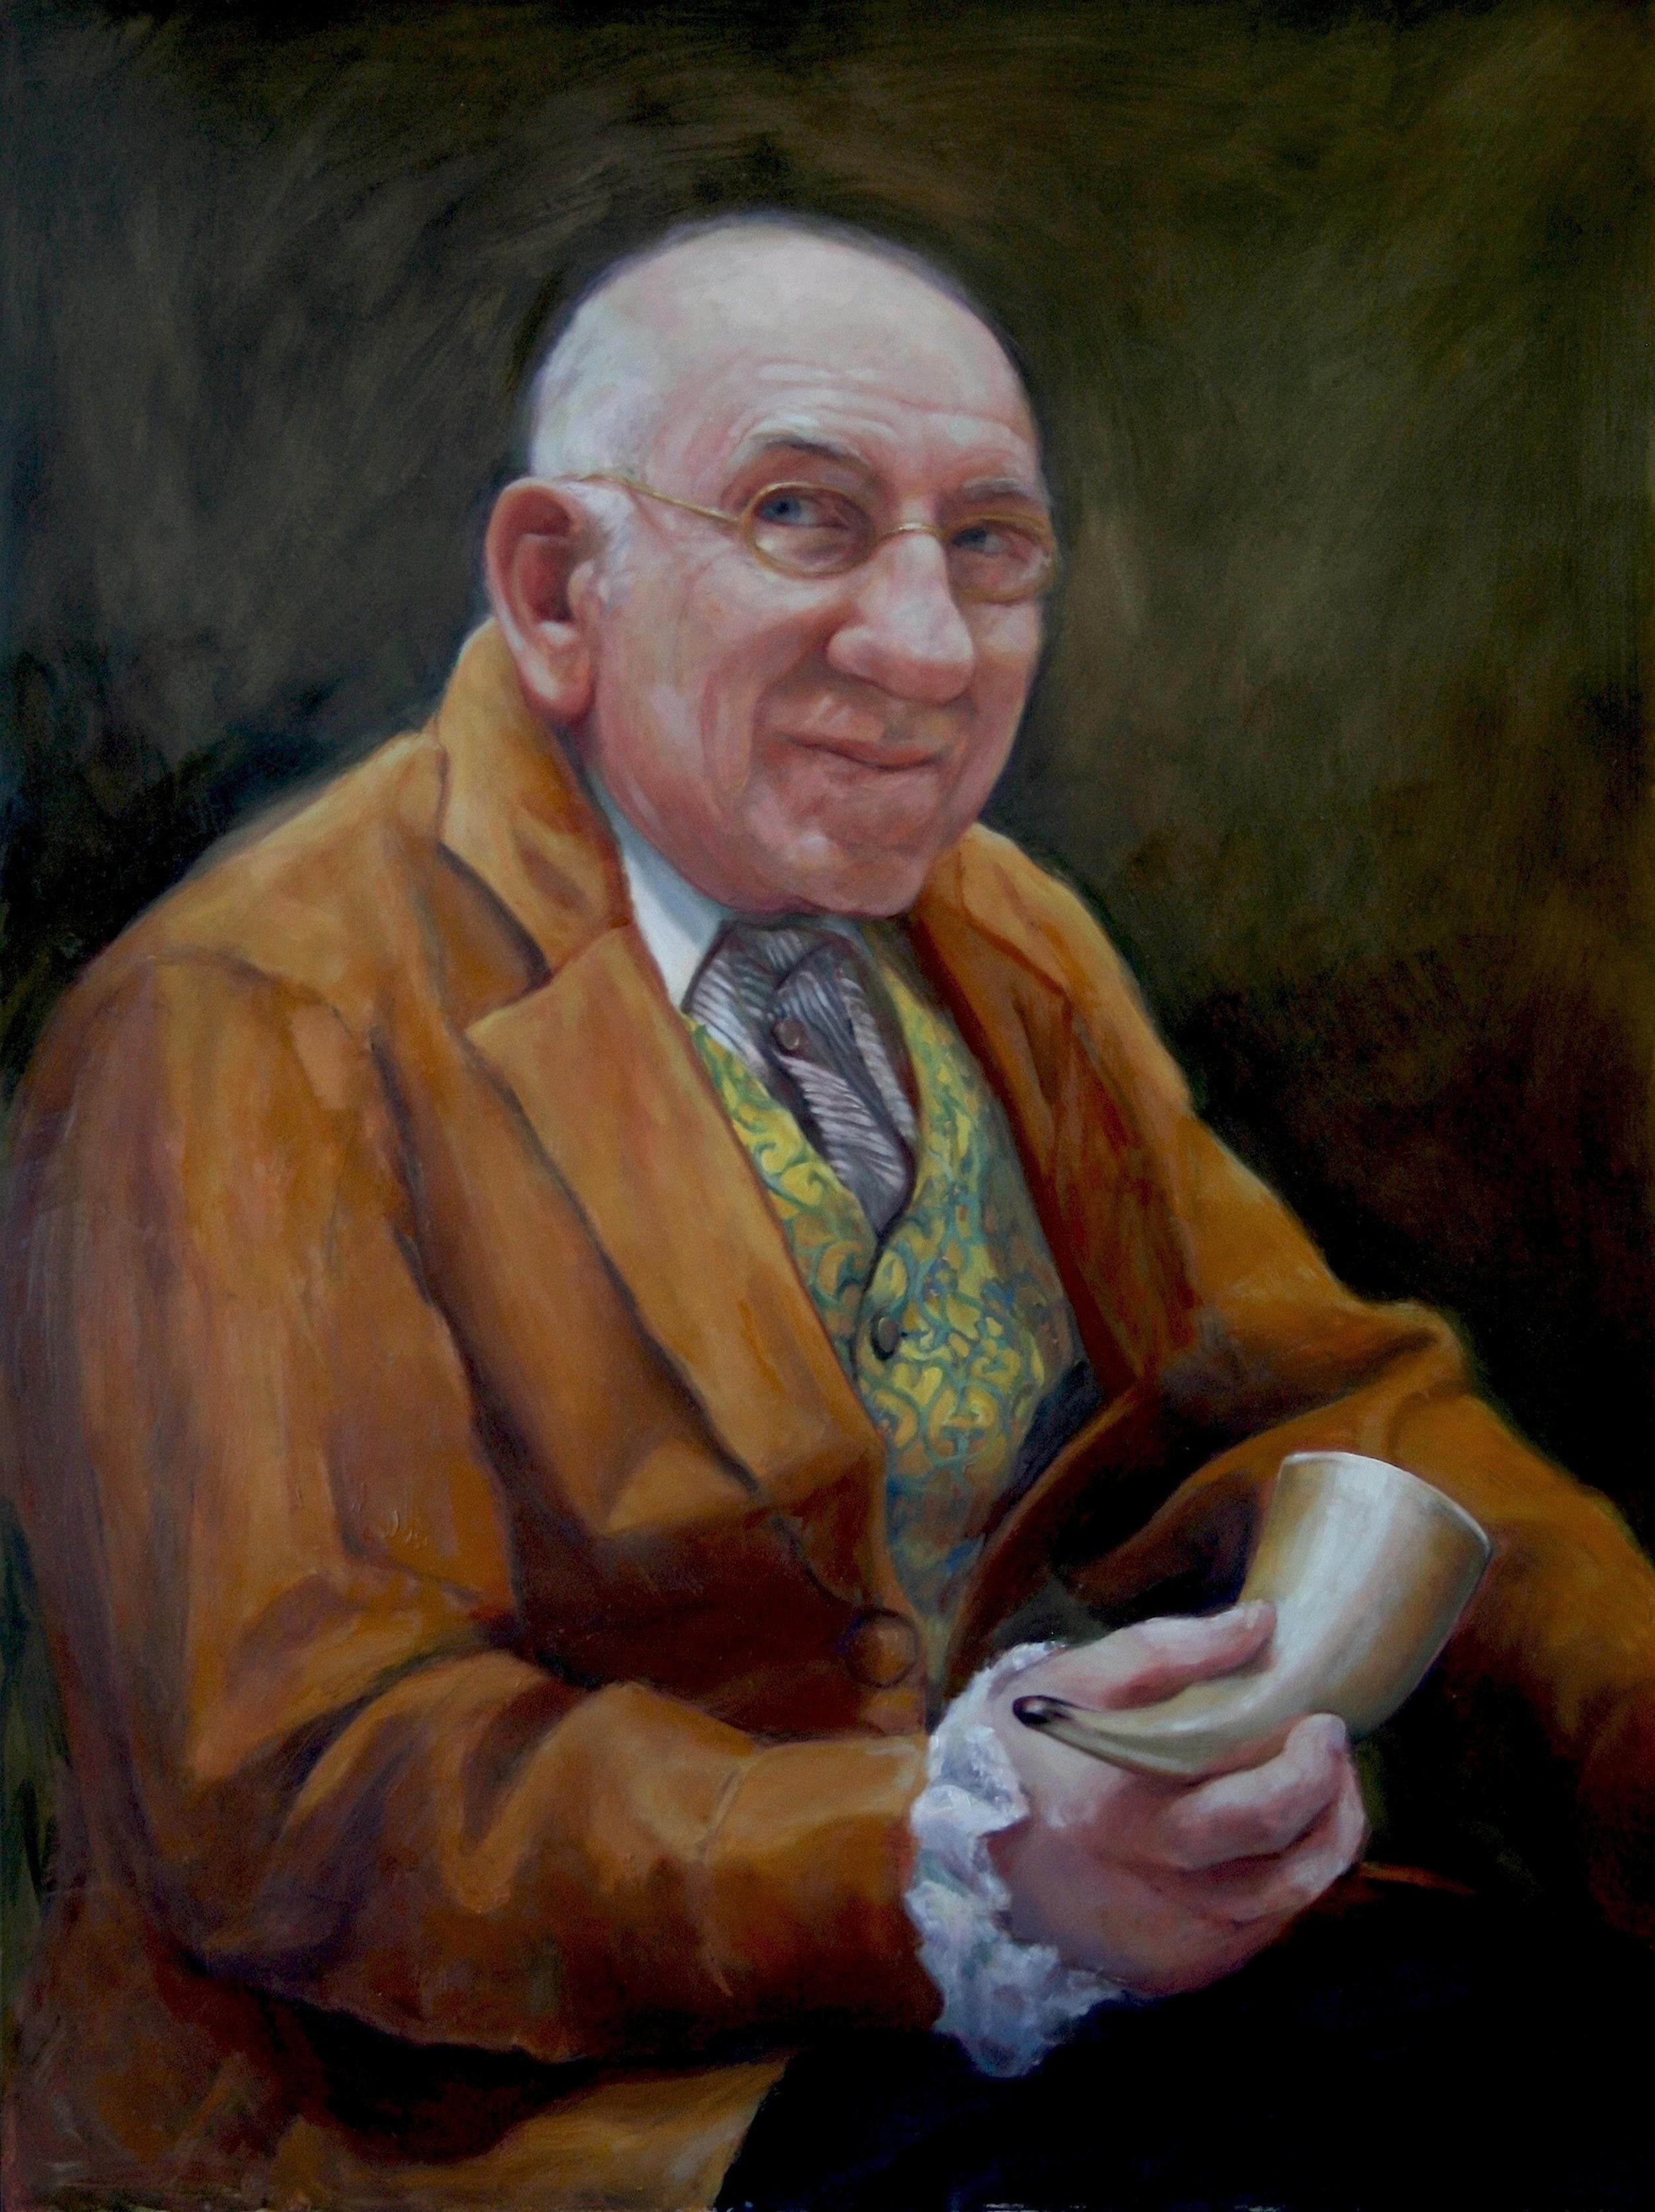 Mr. Sanford Wolfmeyer as Nutcracker Grandfather